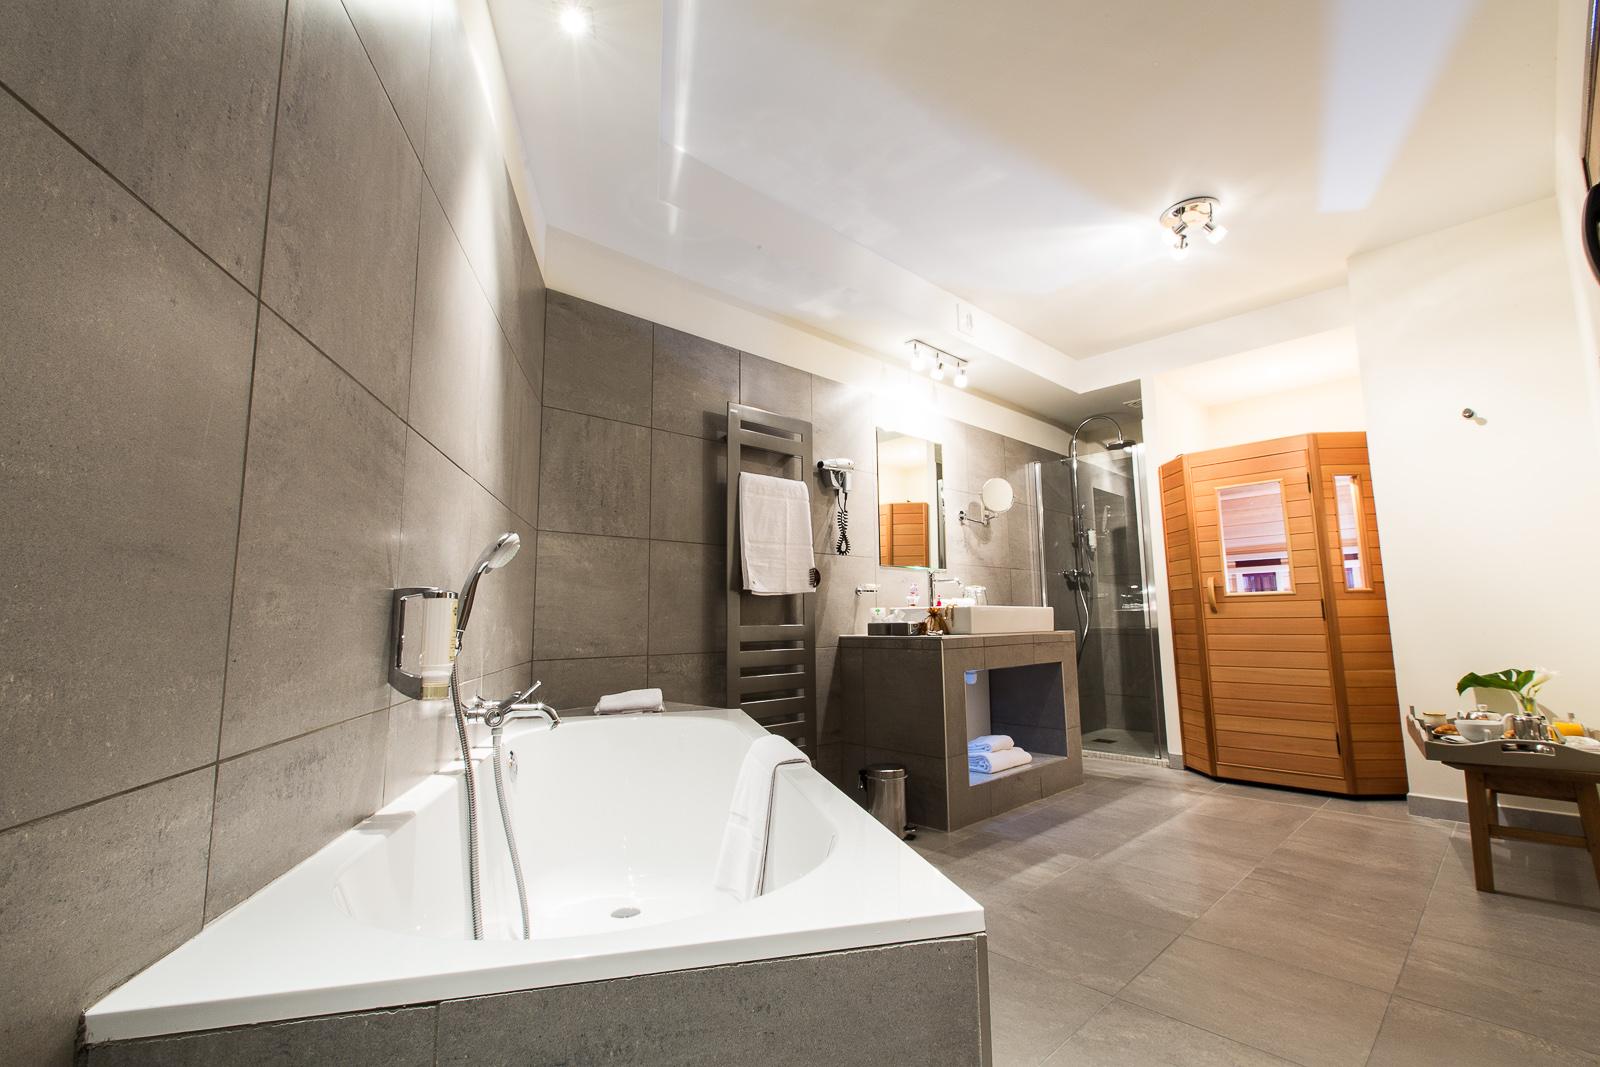 Hôtel Marotte - appartement sauna